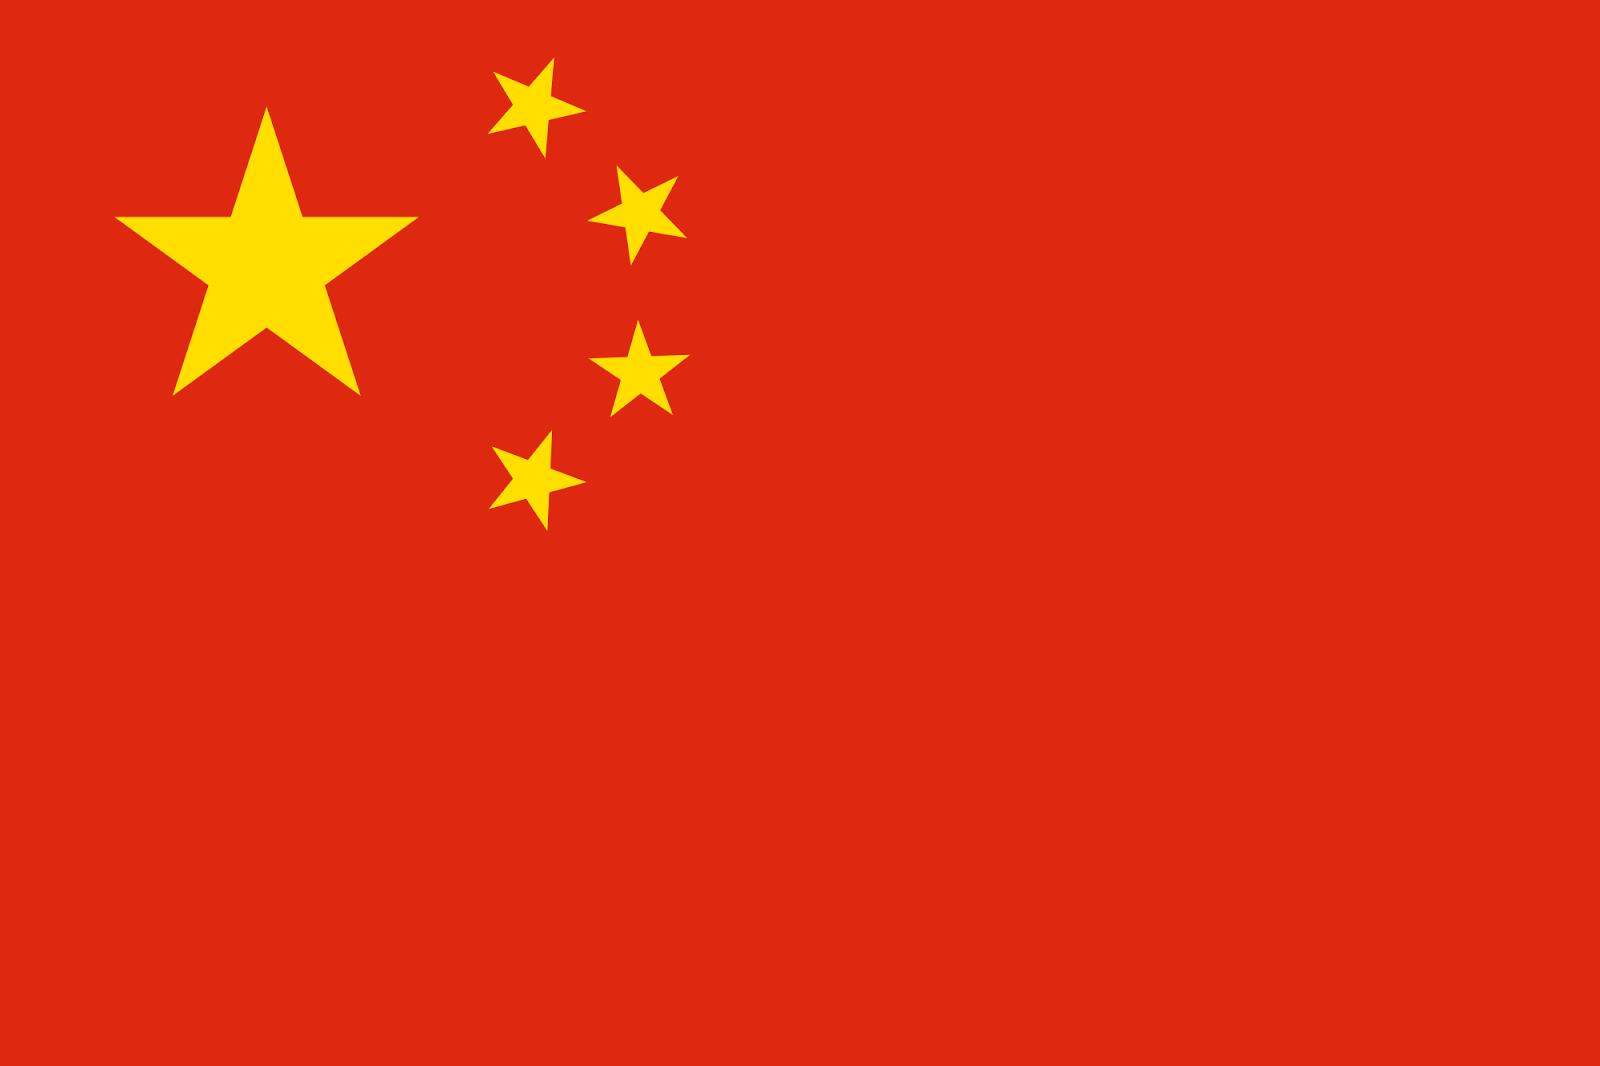 http://carbrandsincurrentproduction.blogspot.com.es/search/label/China